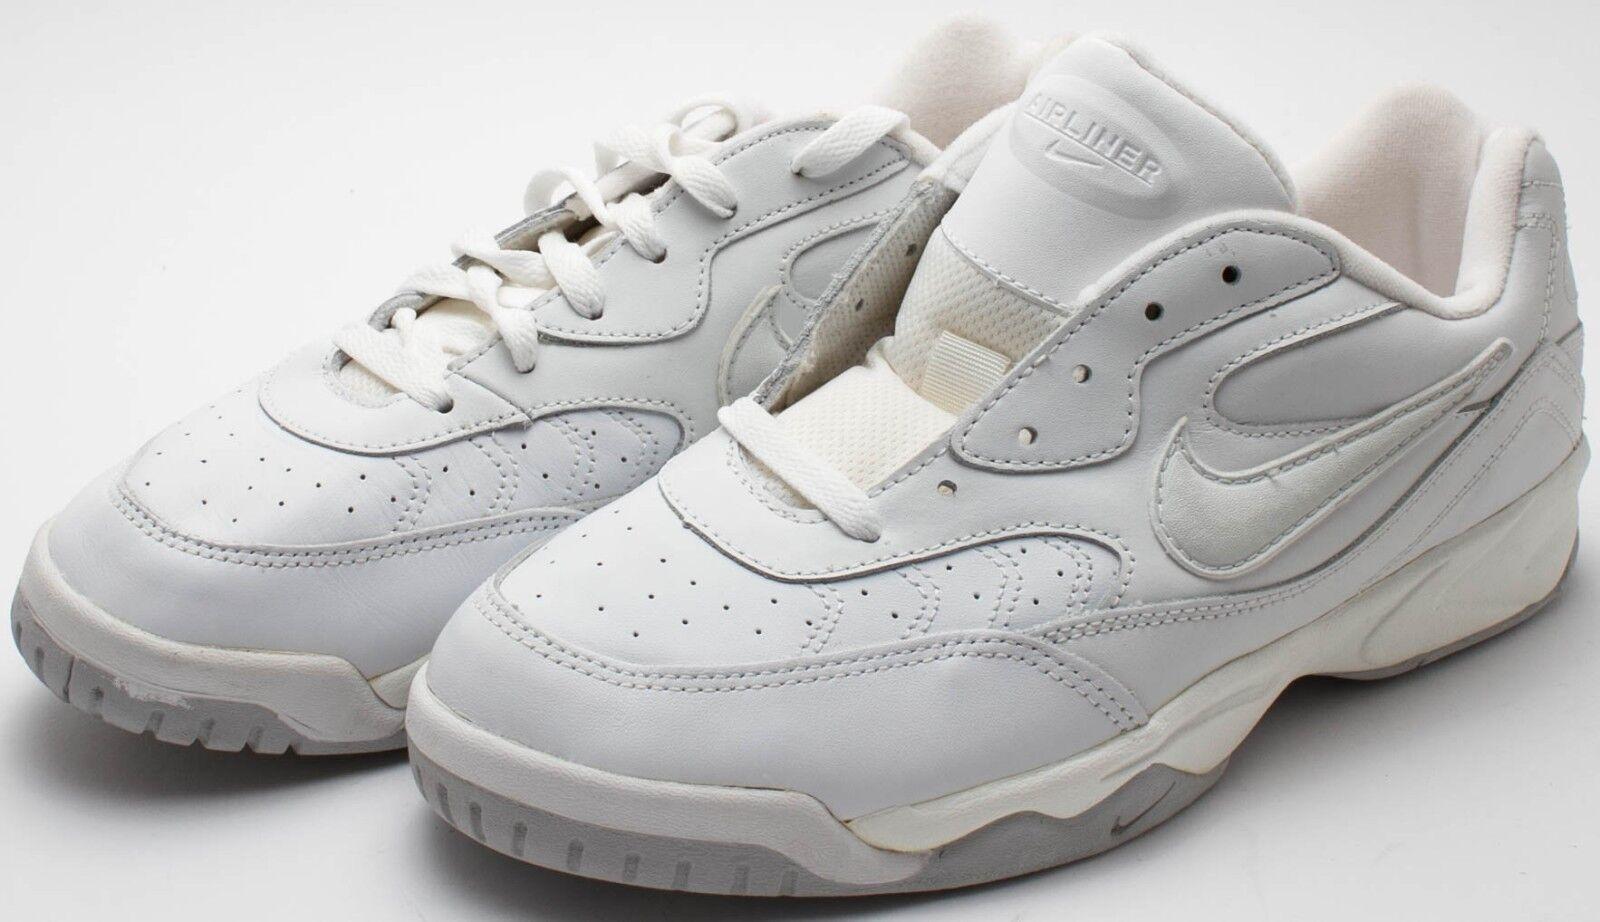 Nike Uomo OG Vintage Vintage Vintage 1998 Air Rivalry II A.S. bianca grigio 140468-111 Sz 13 71e55b